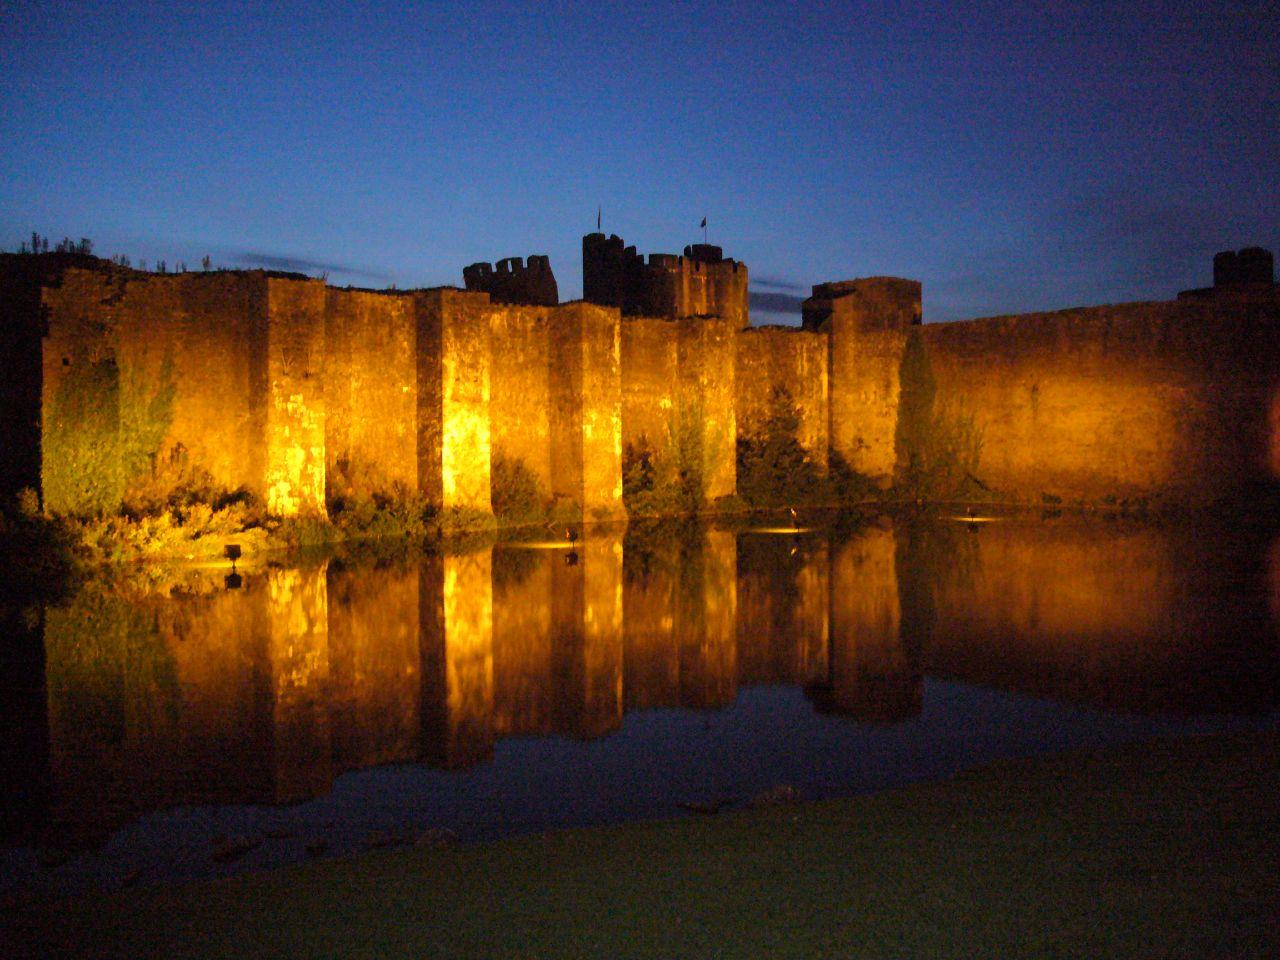 Caerphilly Castle near Cardiff